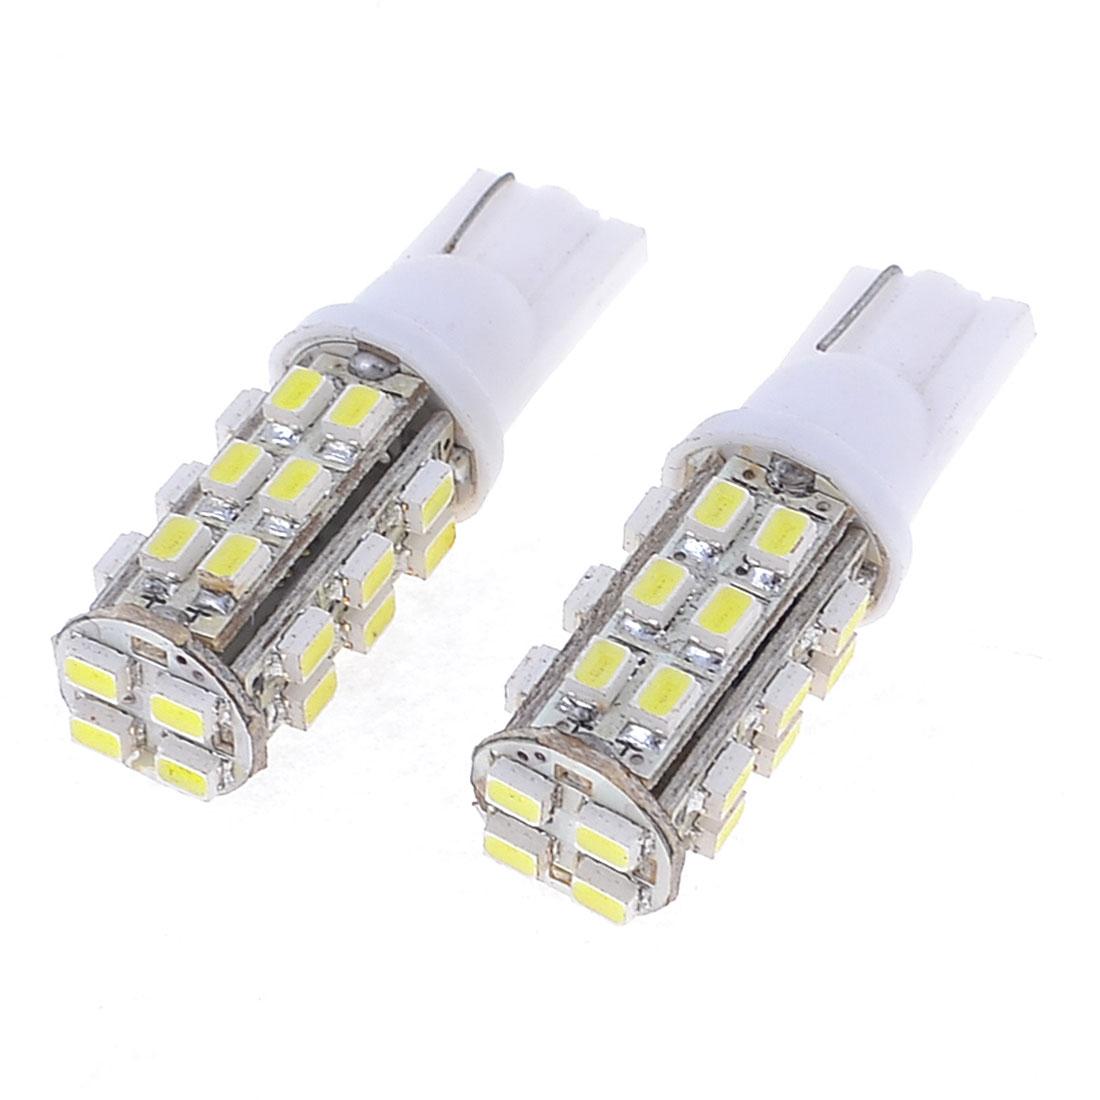 Pair Car T10 194 168 White 1206 SMD 28-LED Tail Turning Light Bulb Lamp